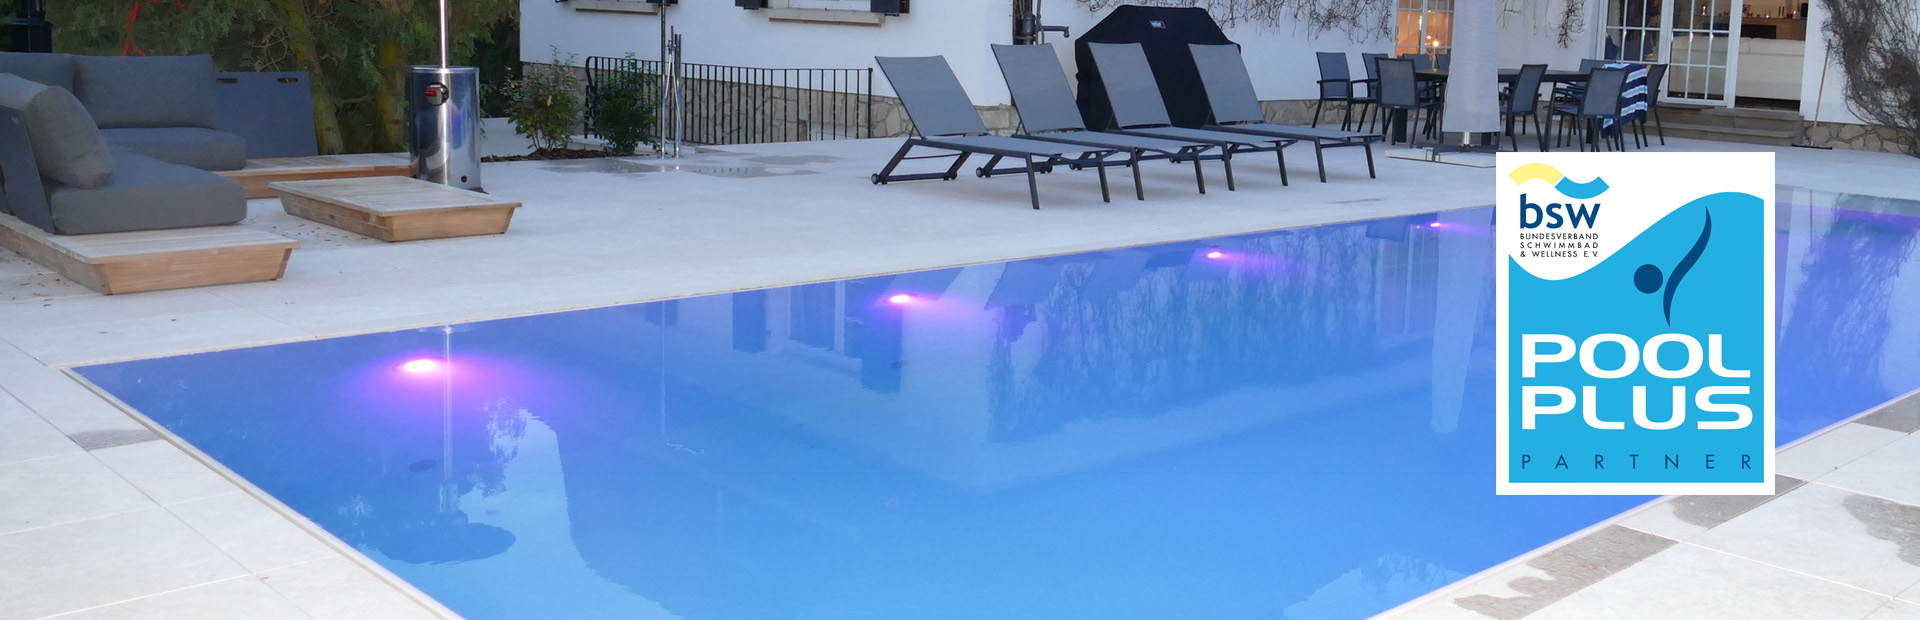 brevet-pool-plus